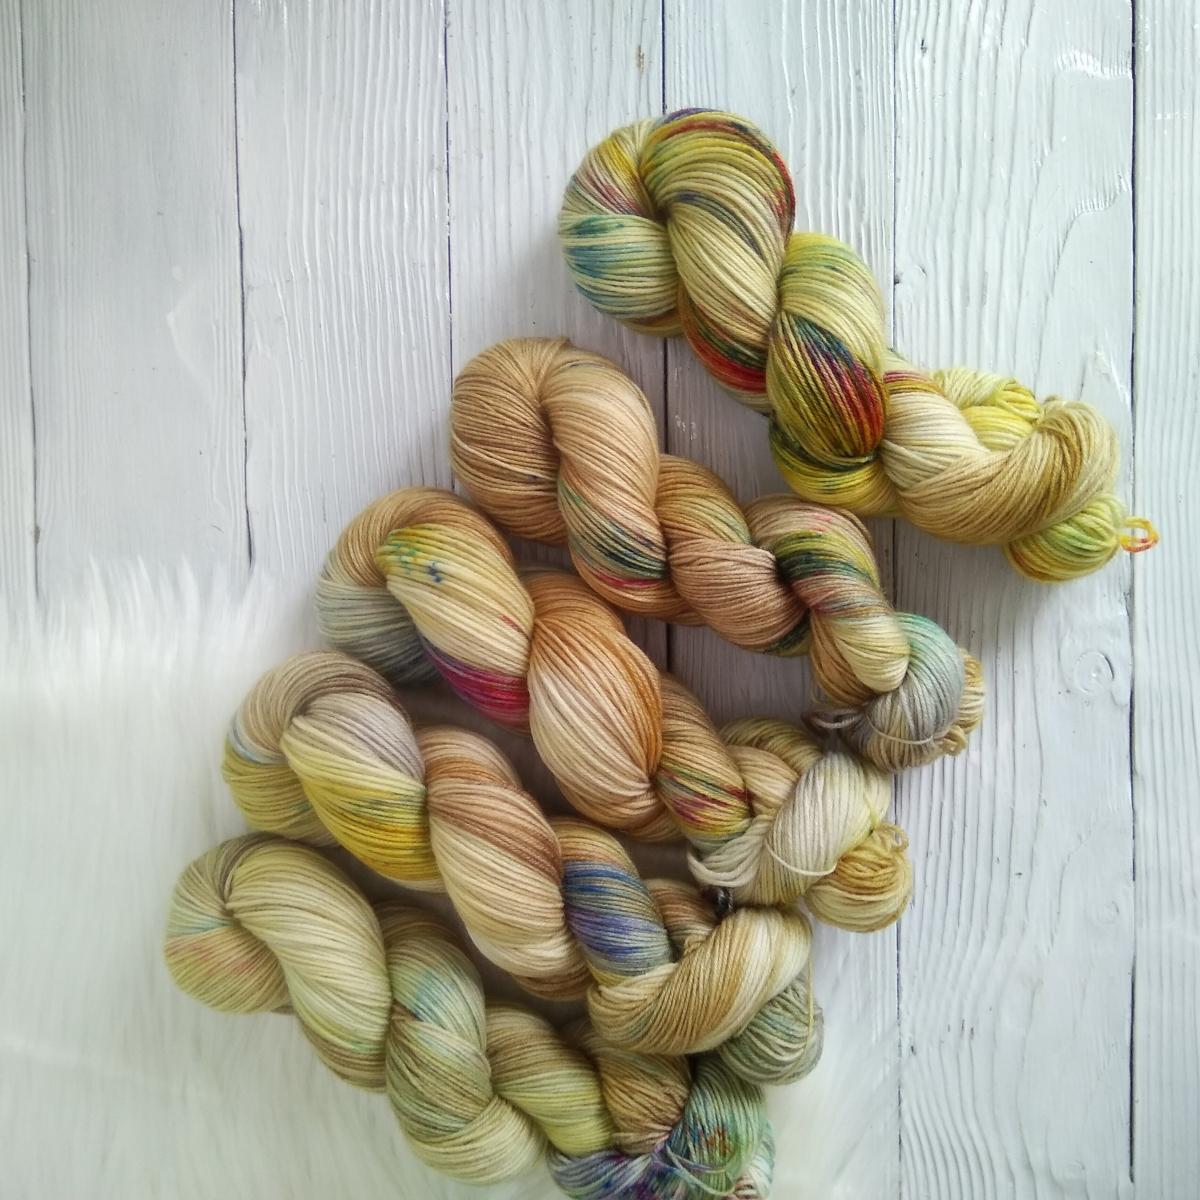 woodico.pro hand dyed yarn 032 5 1200x1200 - Hand dyed yarn / 032